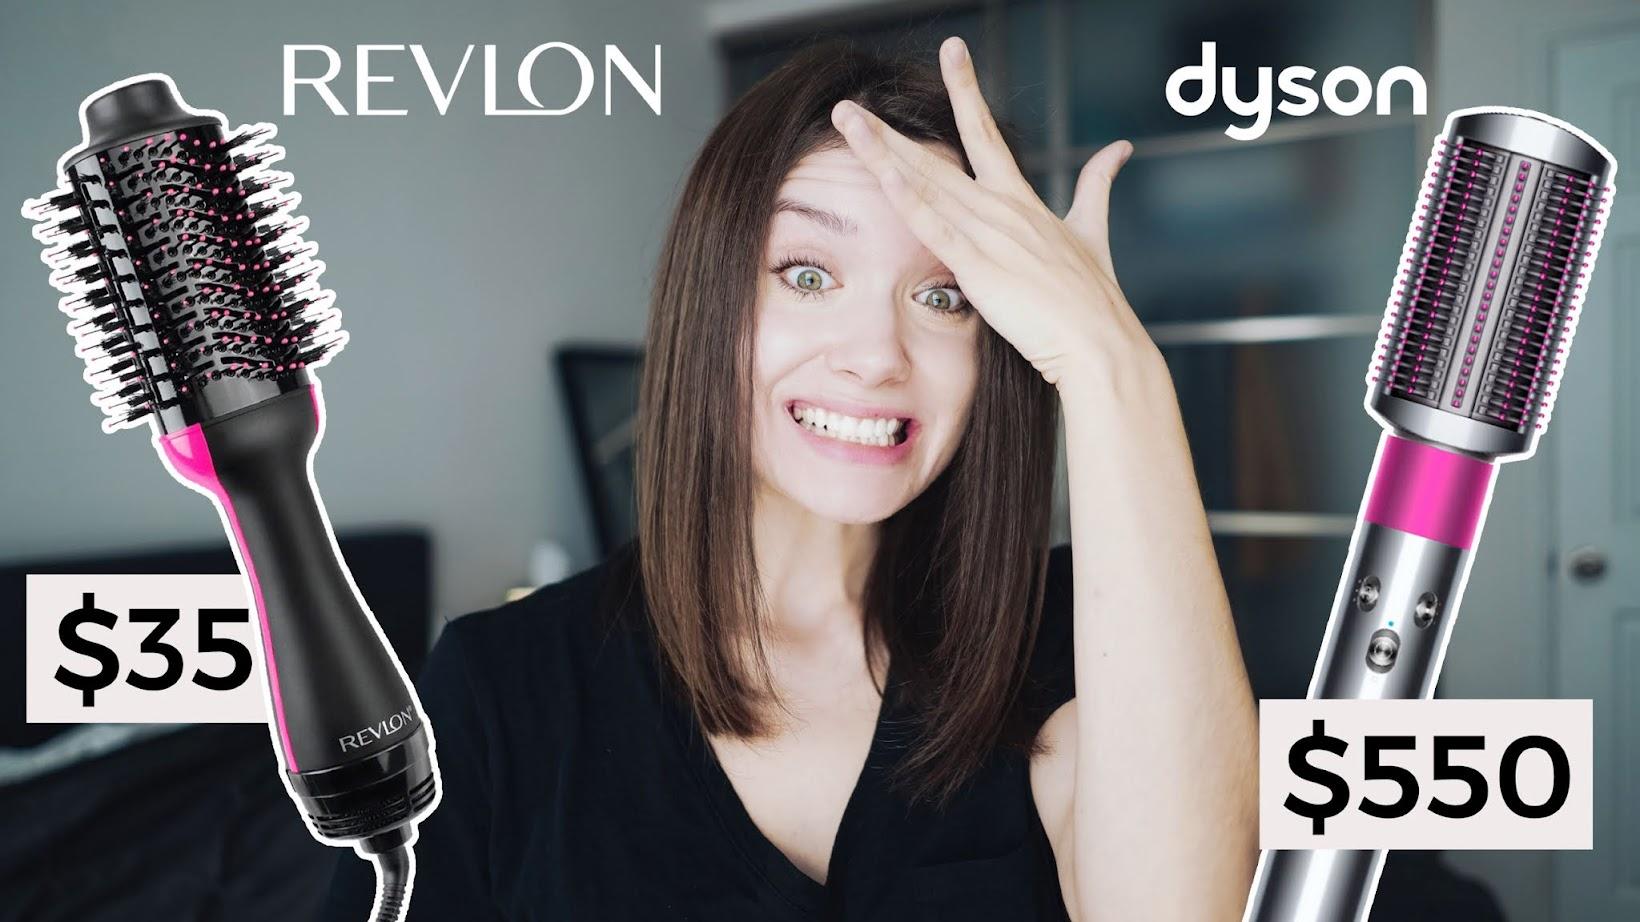 Julia Caban Blog Dyson Airwrap Vs Revlon One Step Hair Dryer Curly Hair 1 Year Review